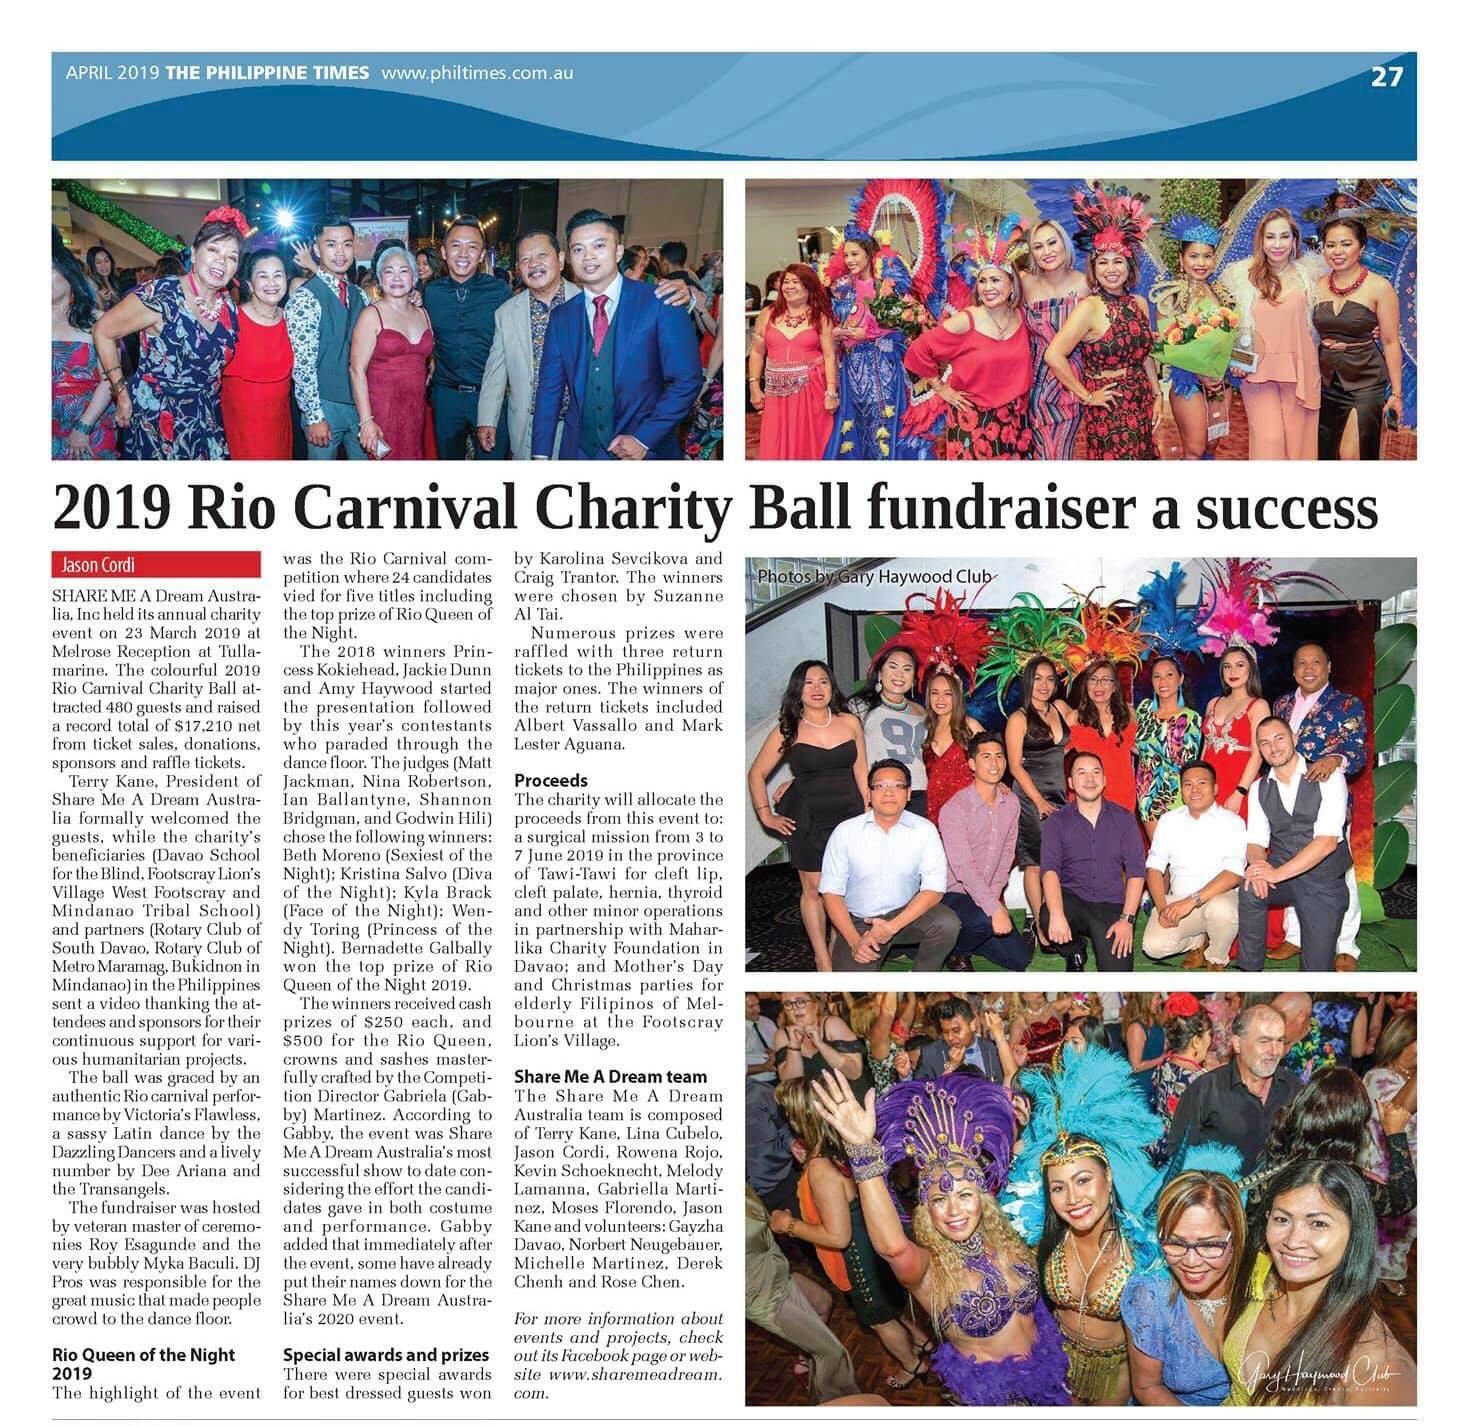 share-me-a-dream-2019-charity-melbourne-australia-philippine-times-media-news-2020.jpg